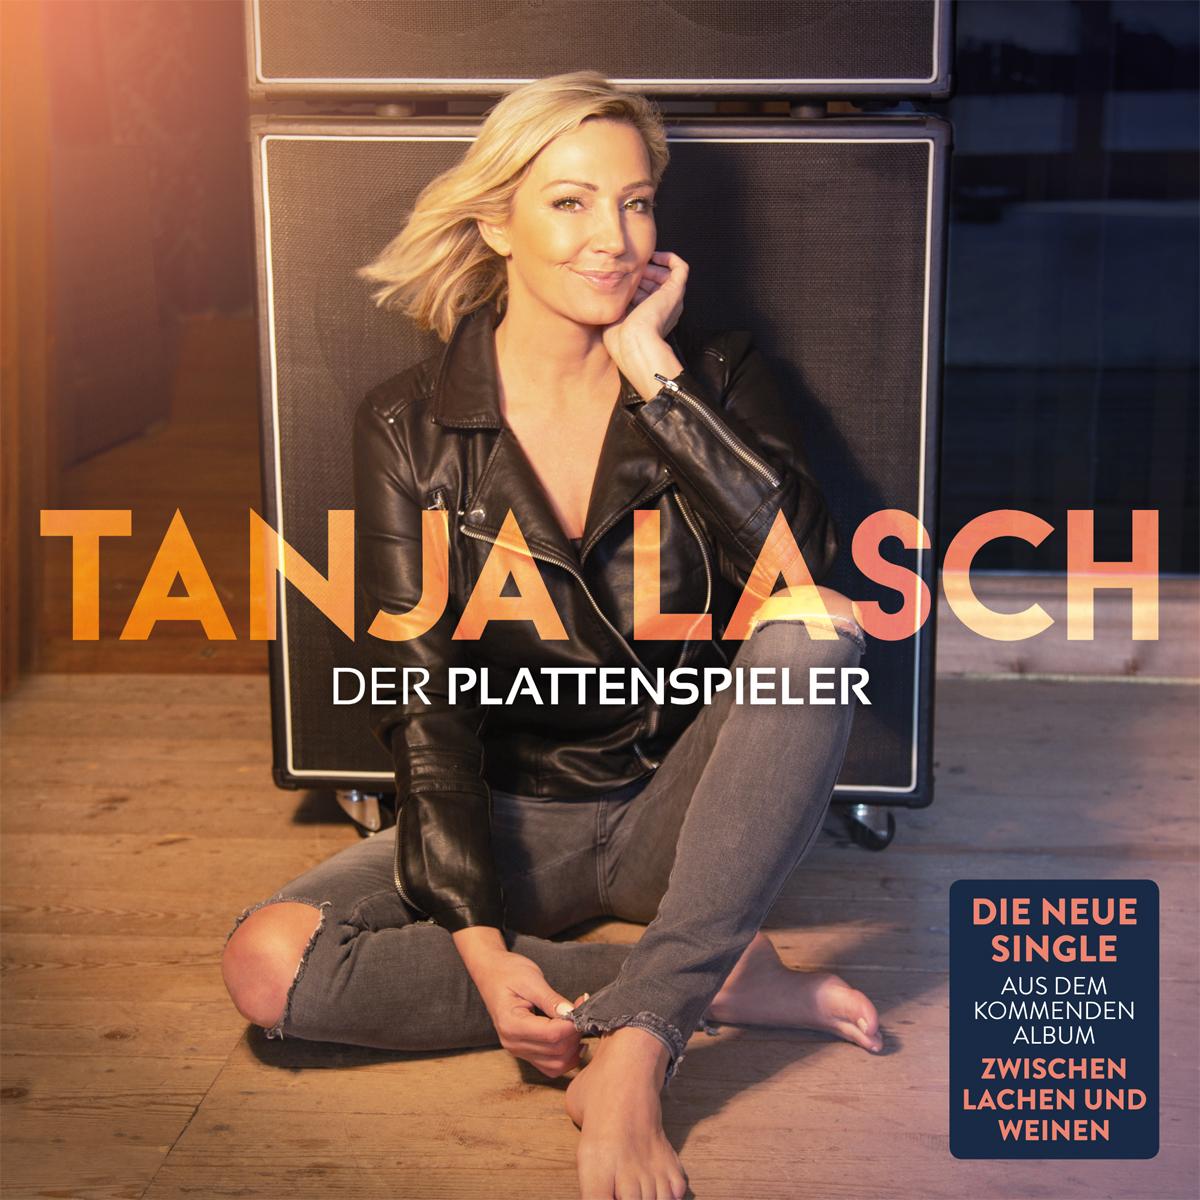 TANJA LASCH * Der Plattenspieler (Single)